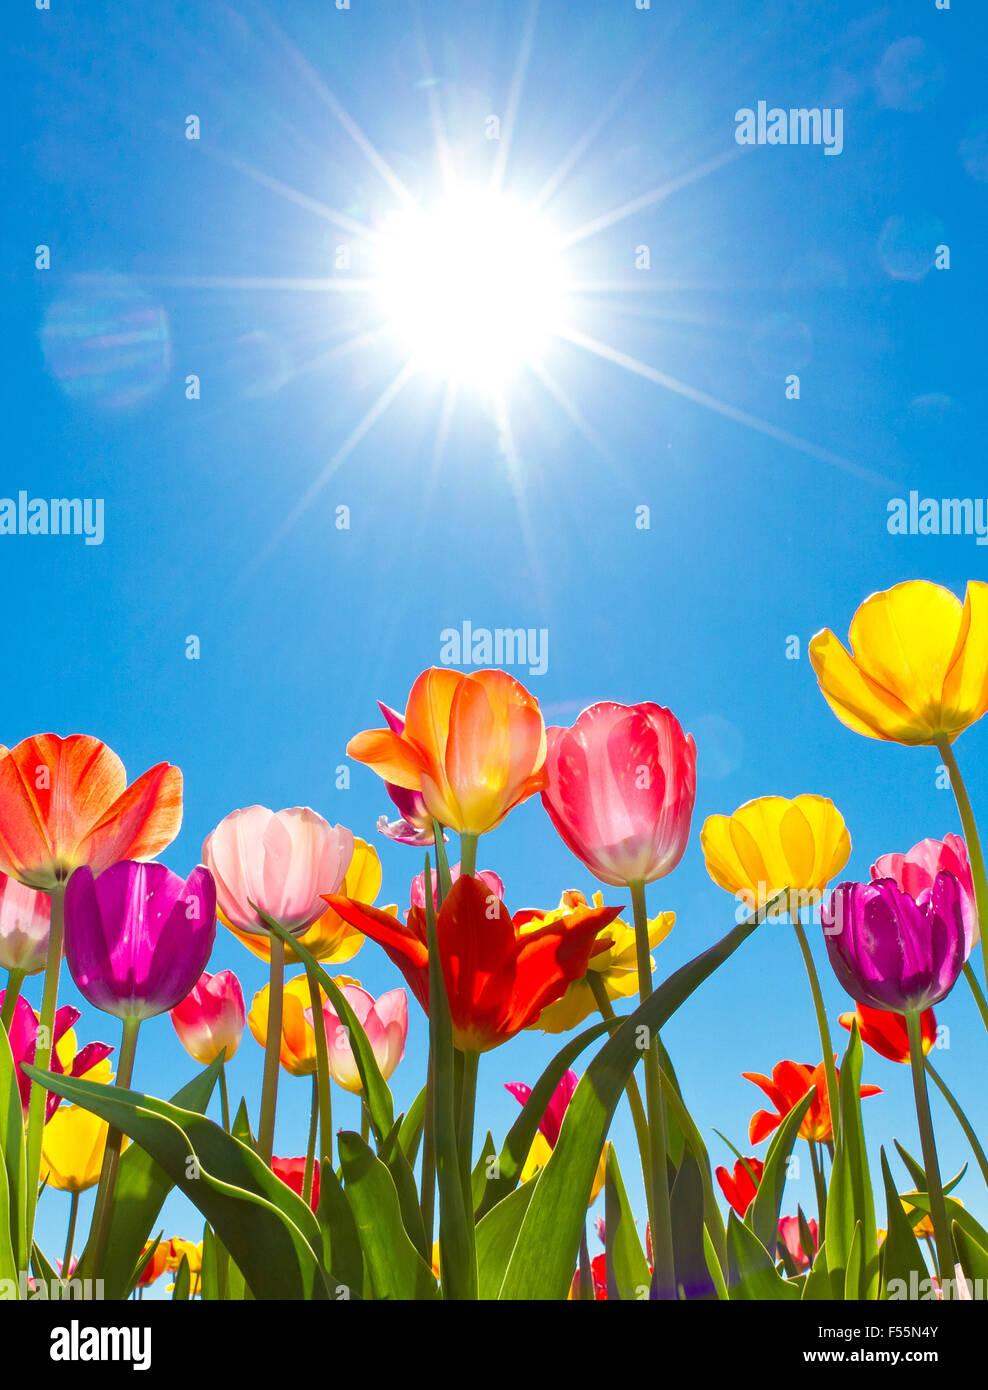 Bunte Tulpen in der Sonne Stockbild